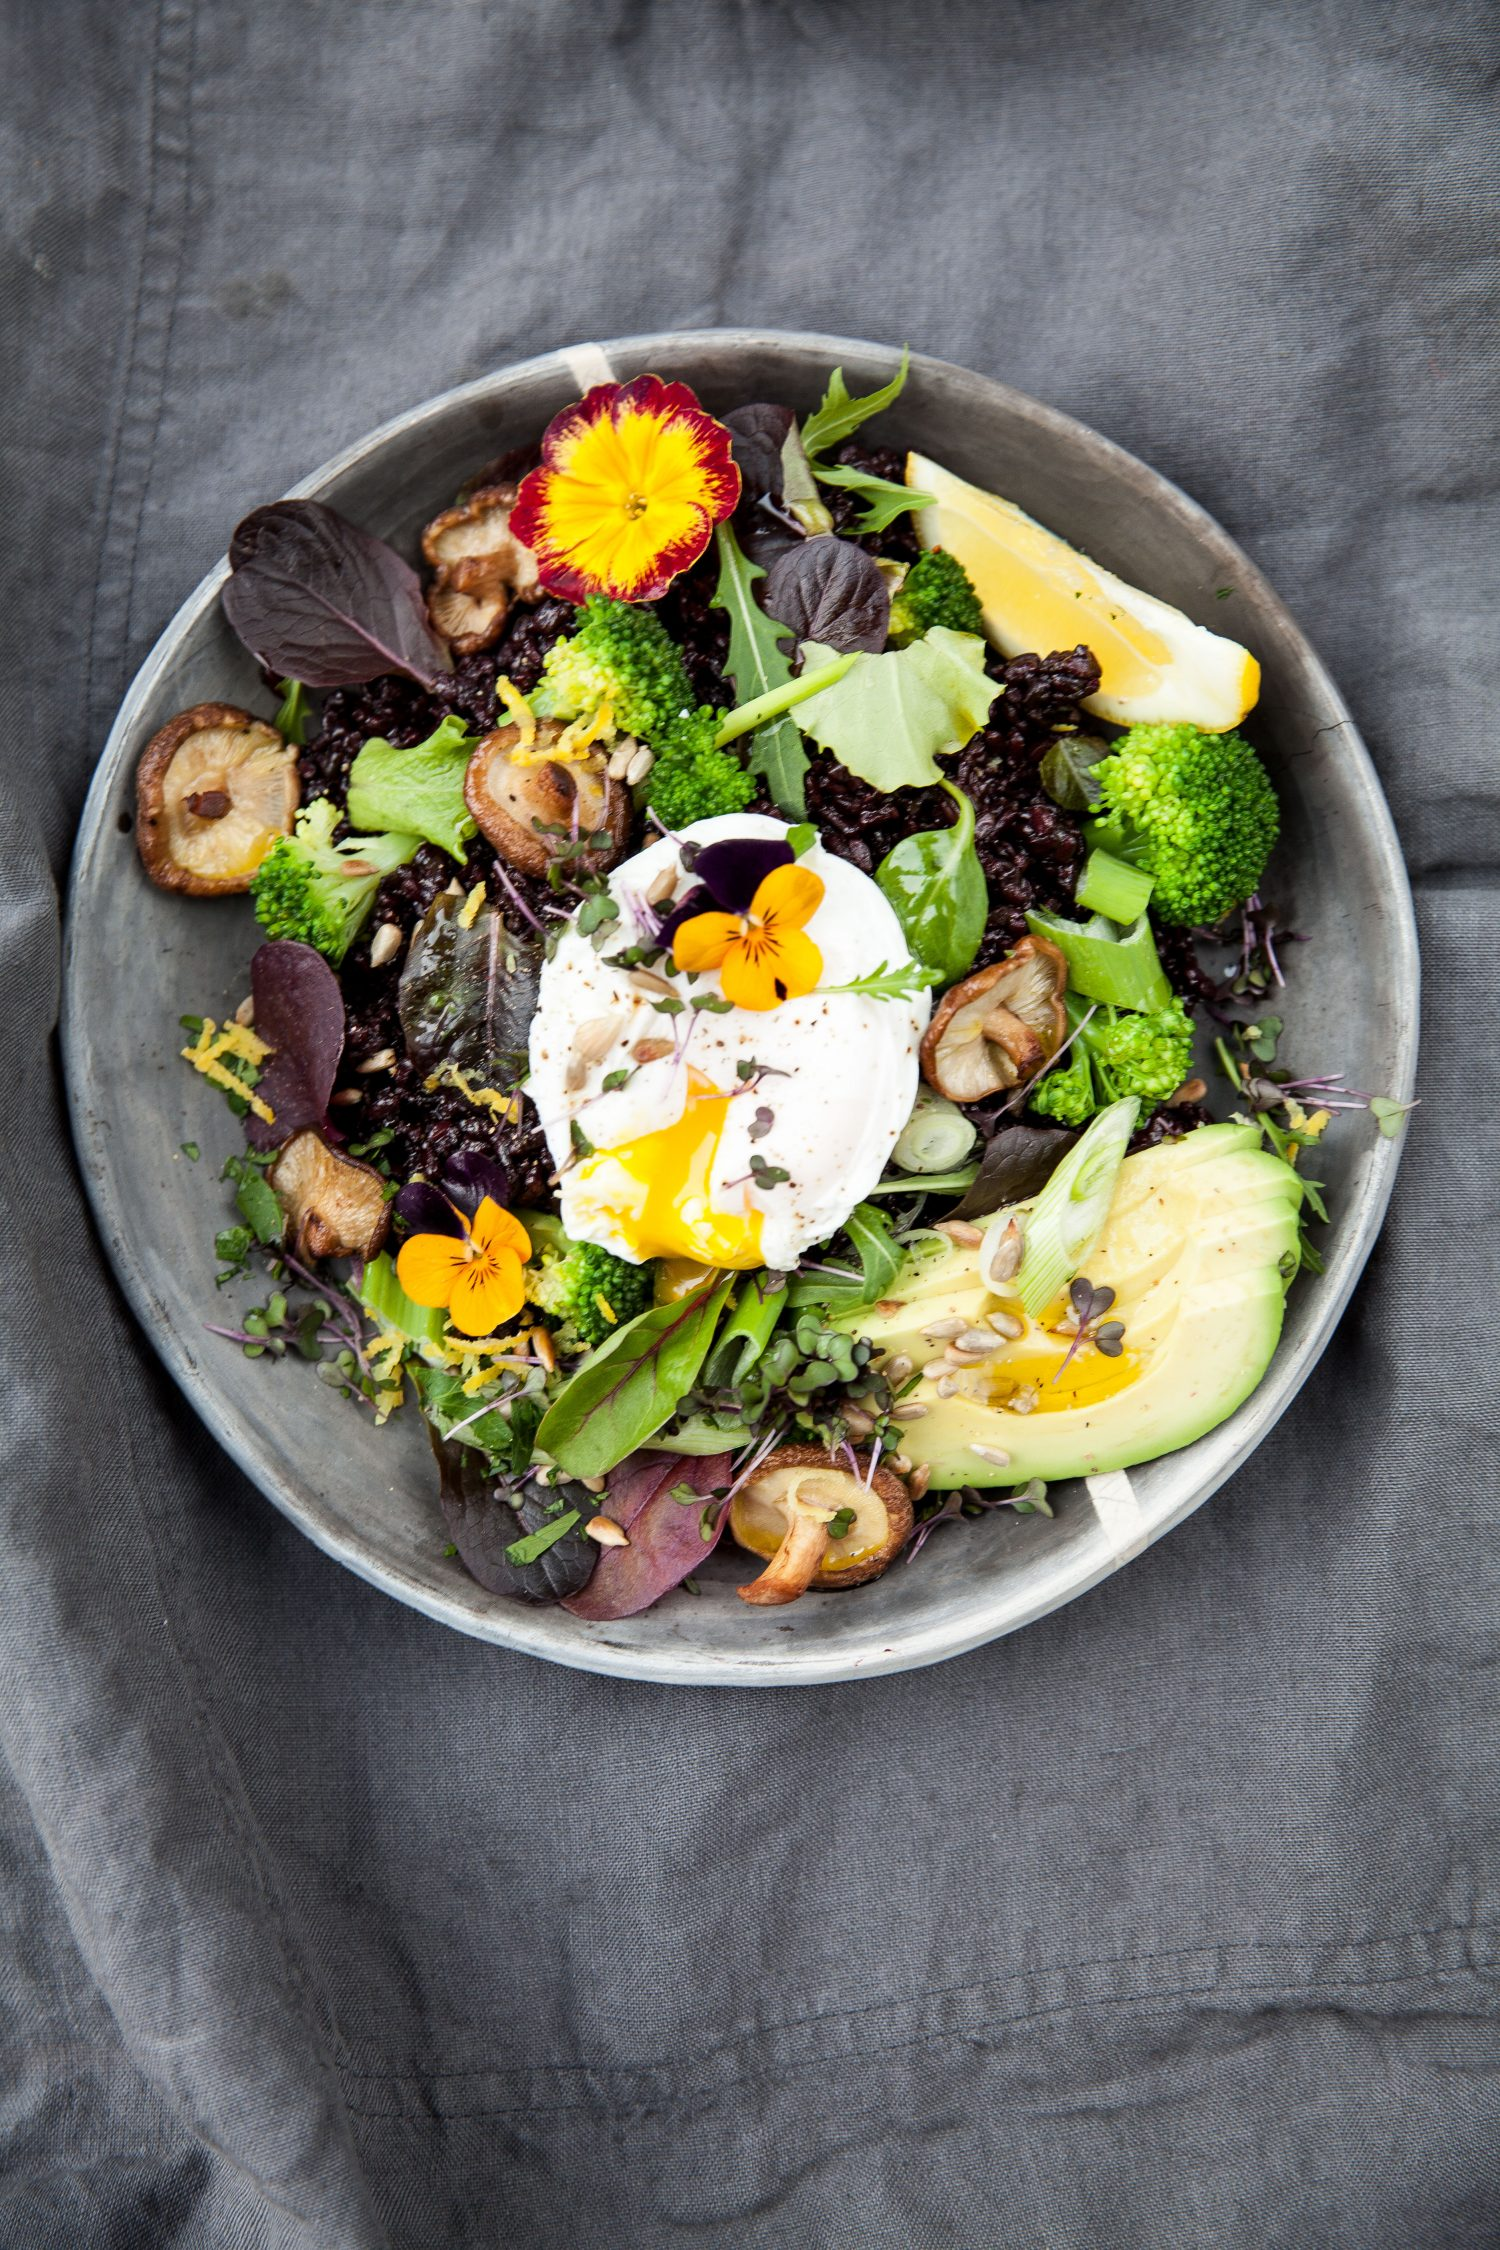 Australia-Inspired Black Rice Salad